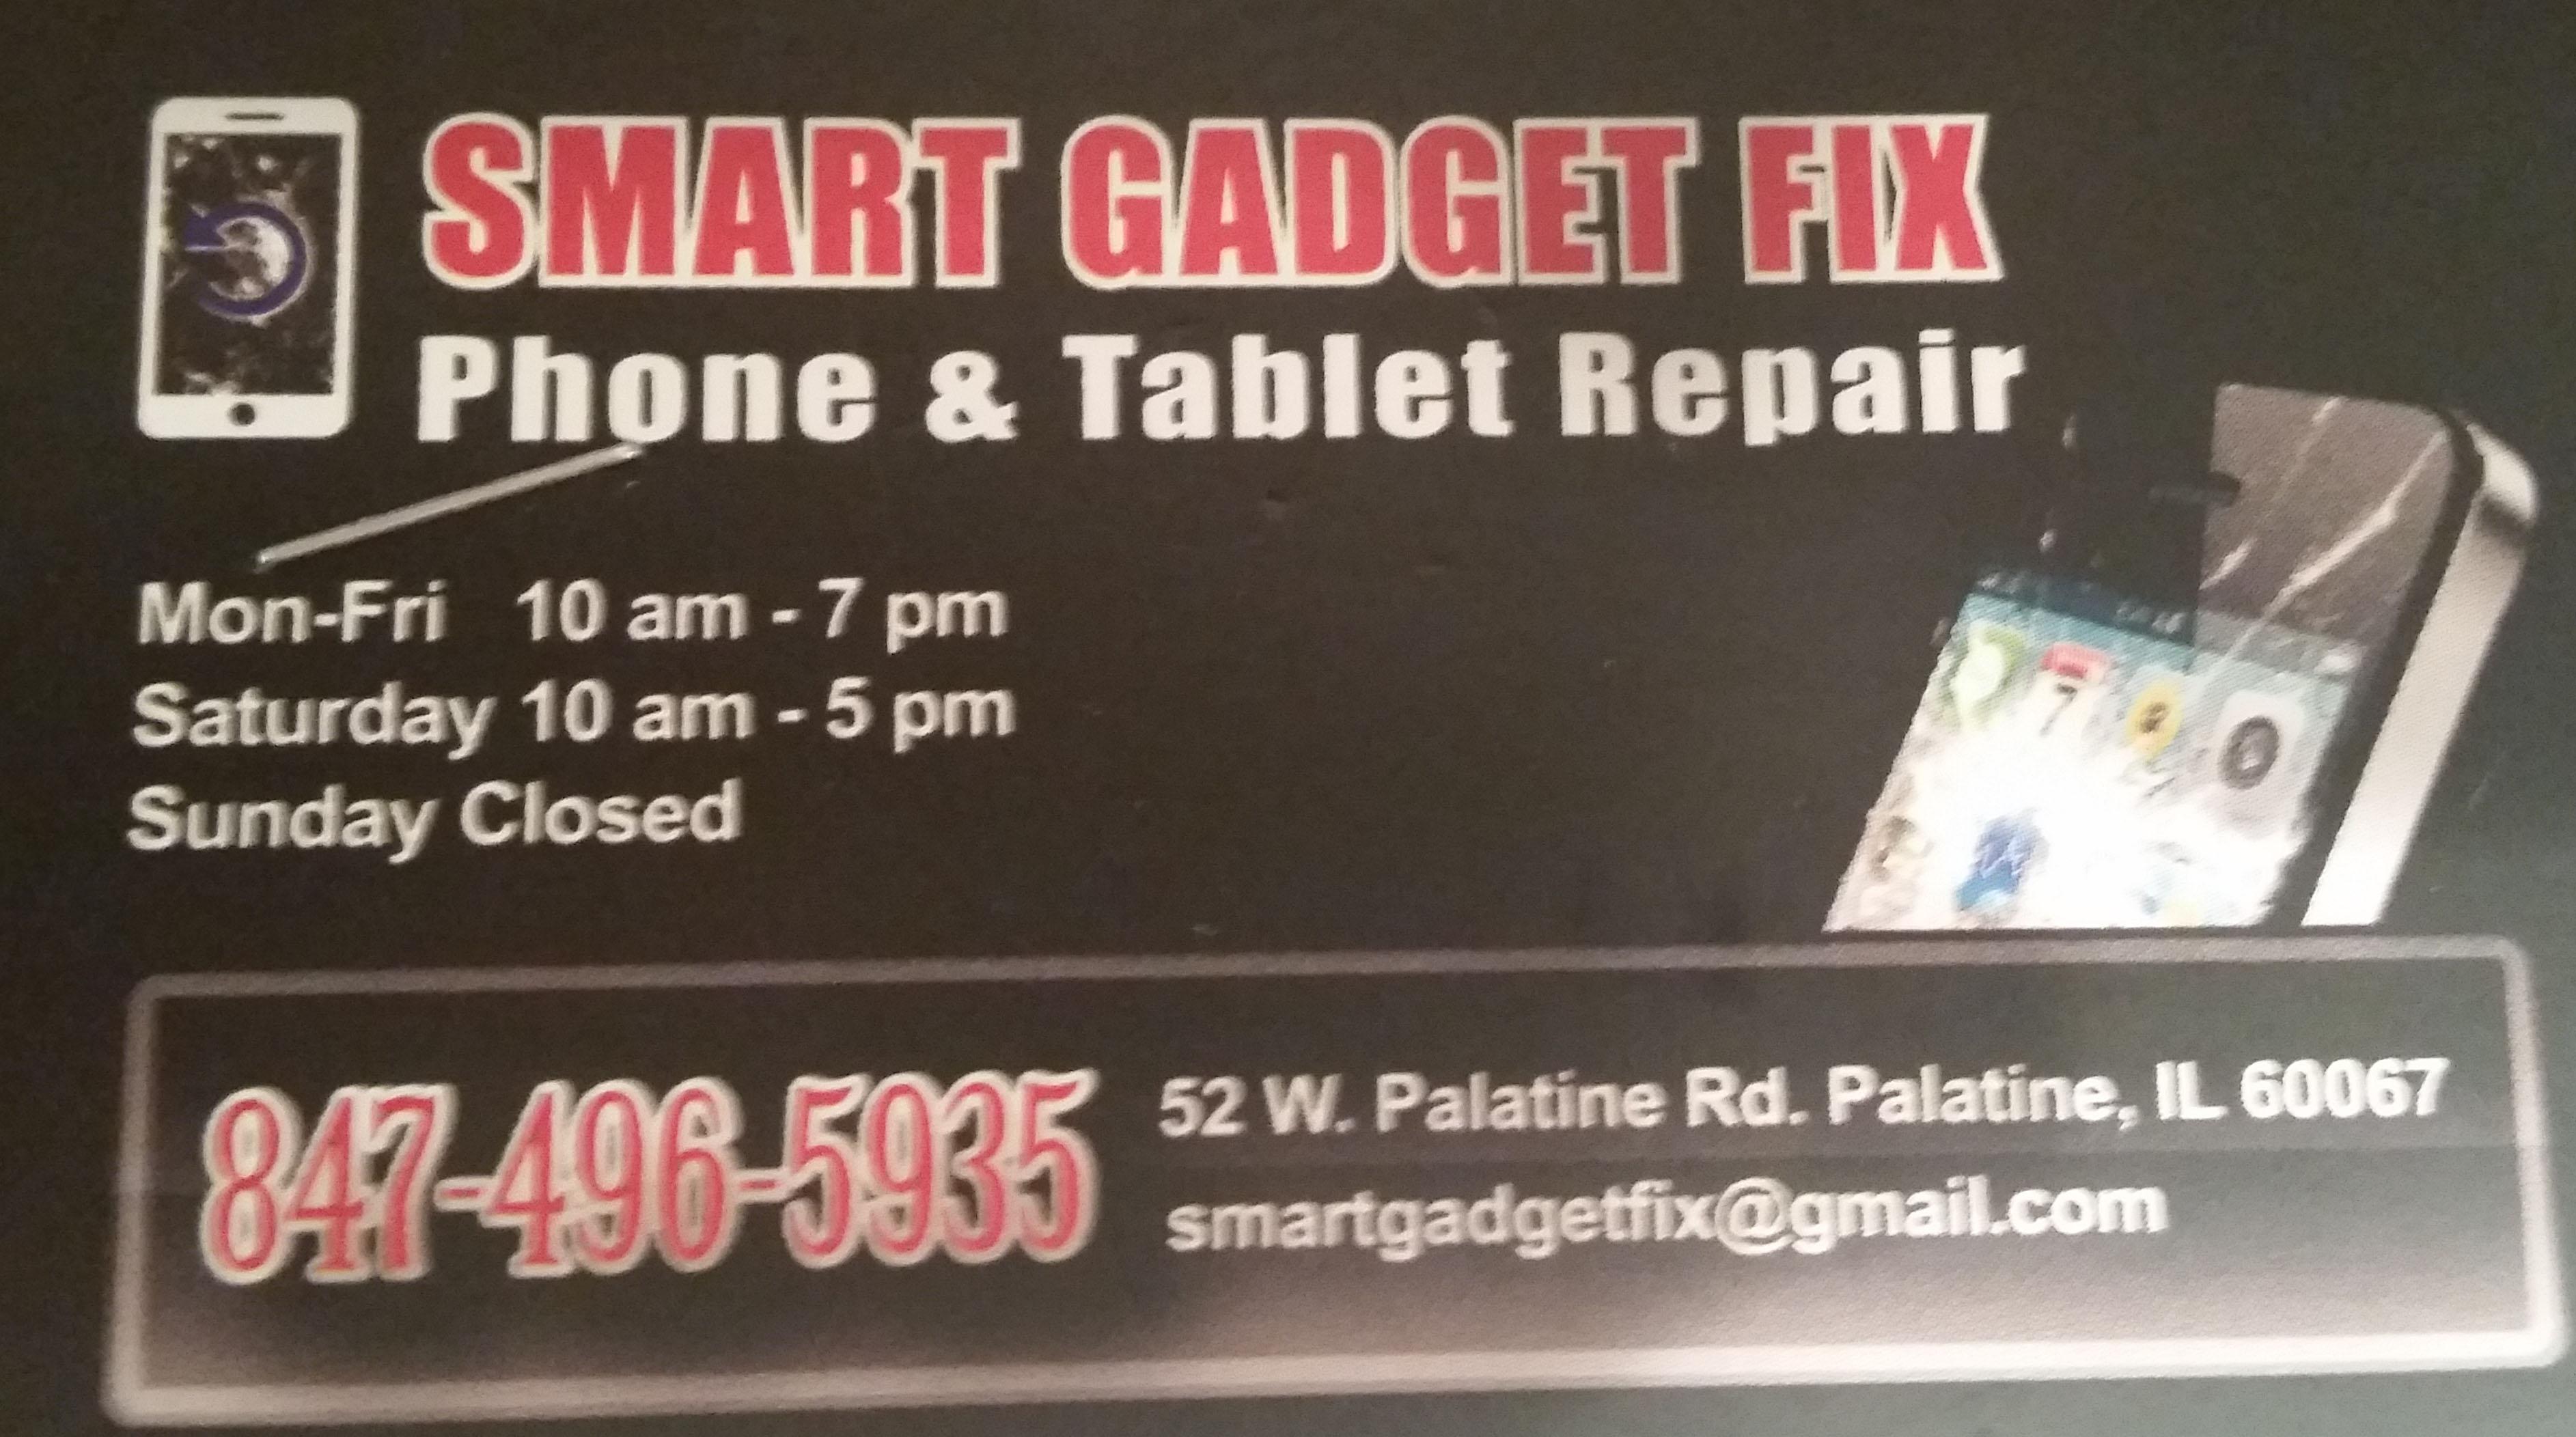 Smart Gadget Fix Palatine